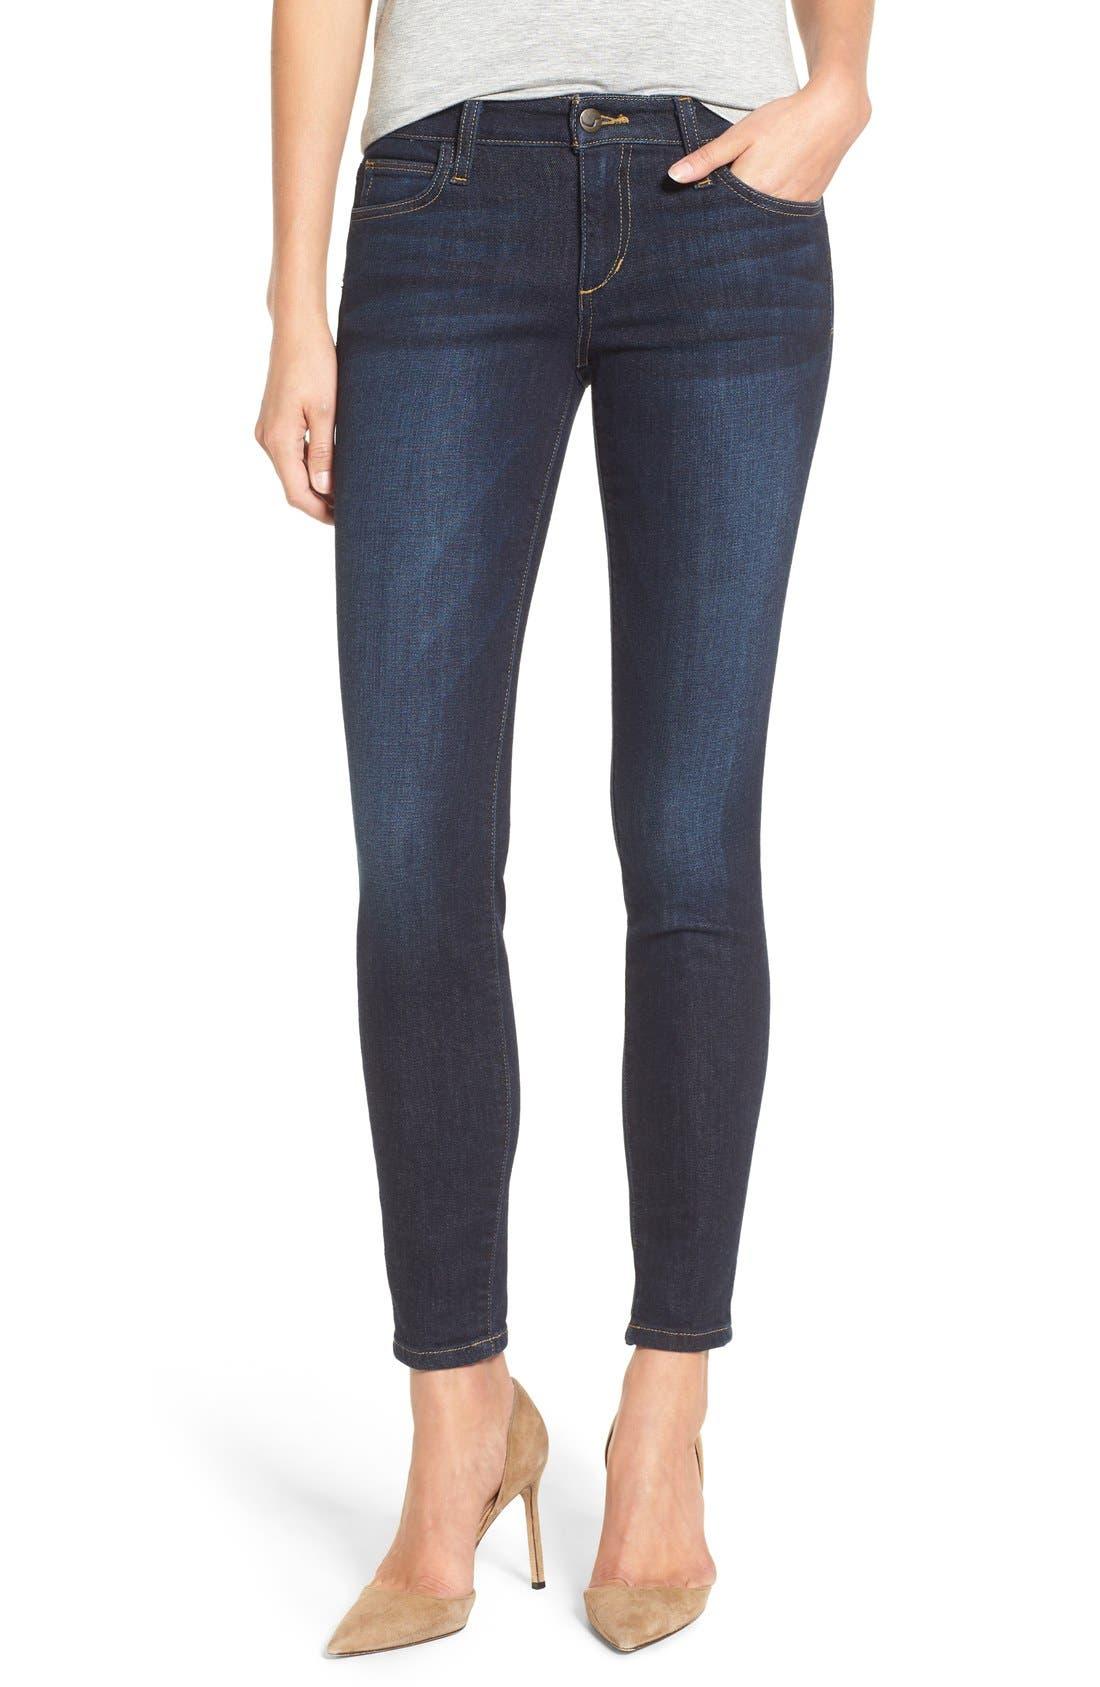 JOE'S, Ankle Skinny Jeans, Main thumbnail 1, color, 410